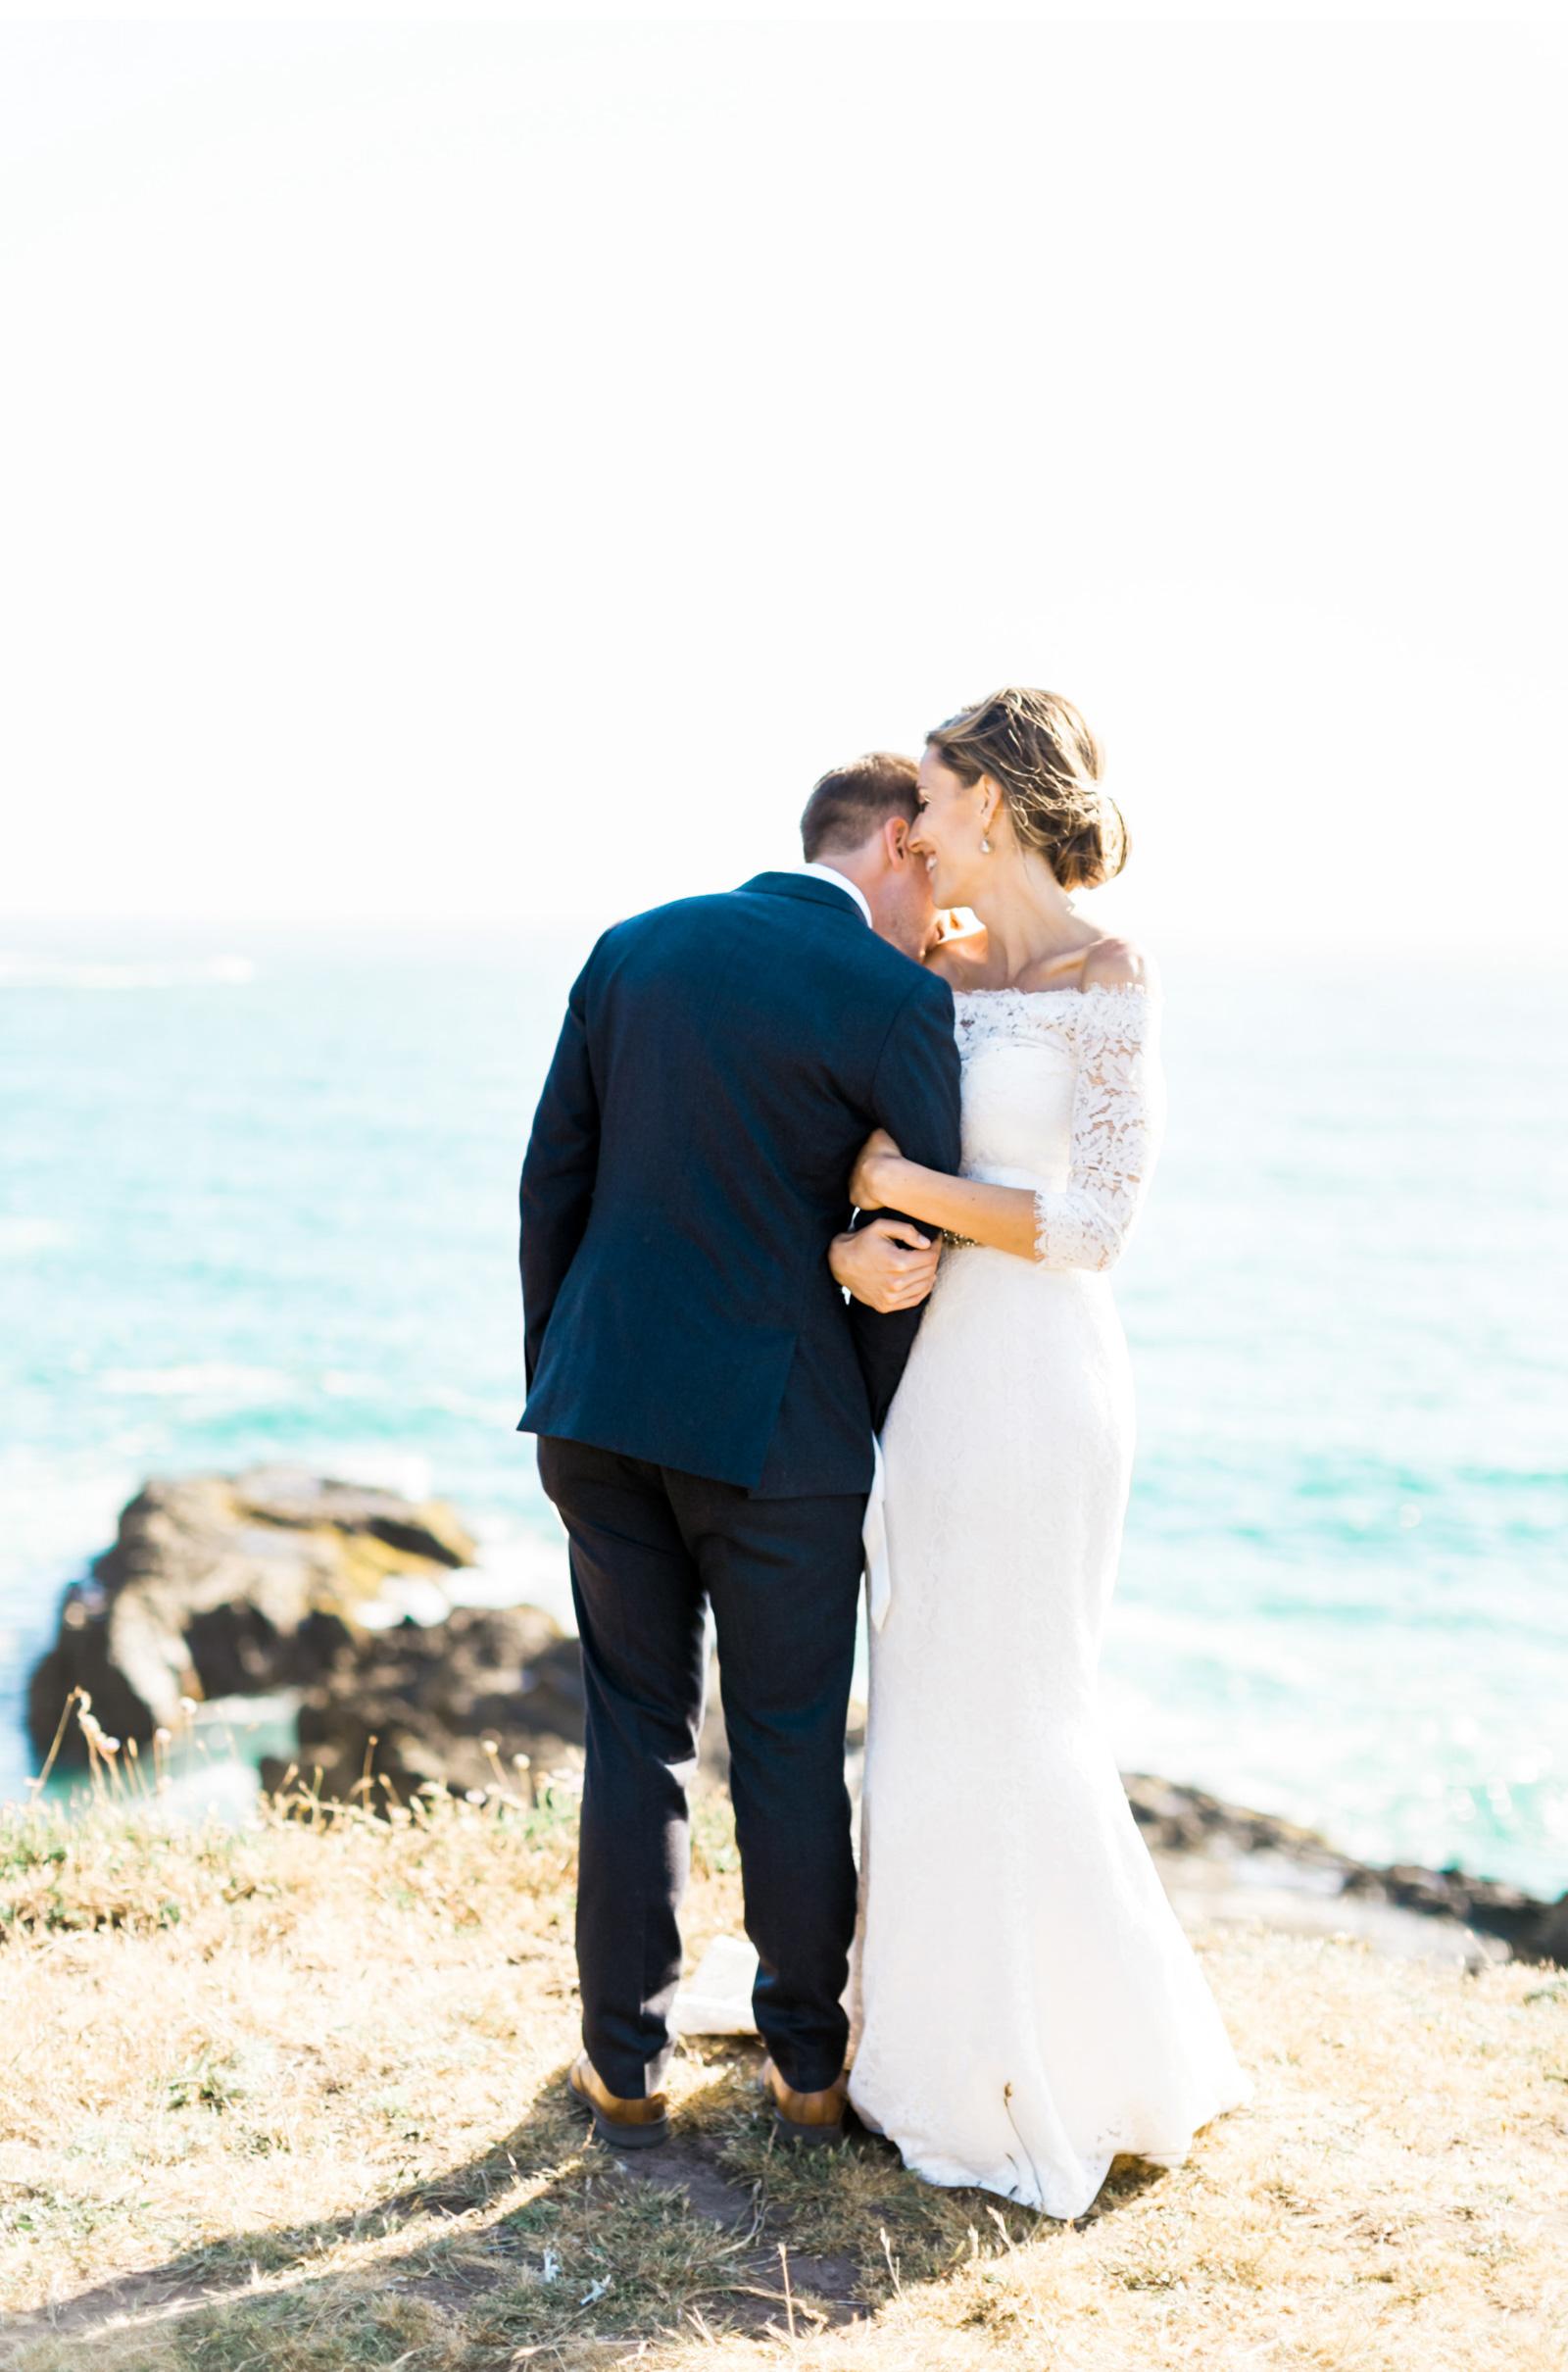 Style-Me-Pretty-Mendocino-Wedding-Natalie-Schutt-Photography_08.jpg